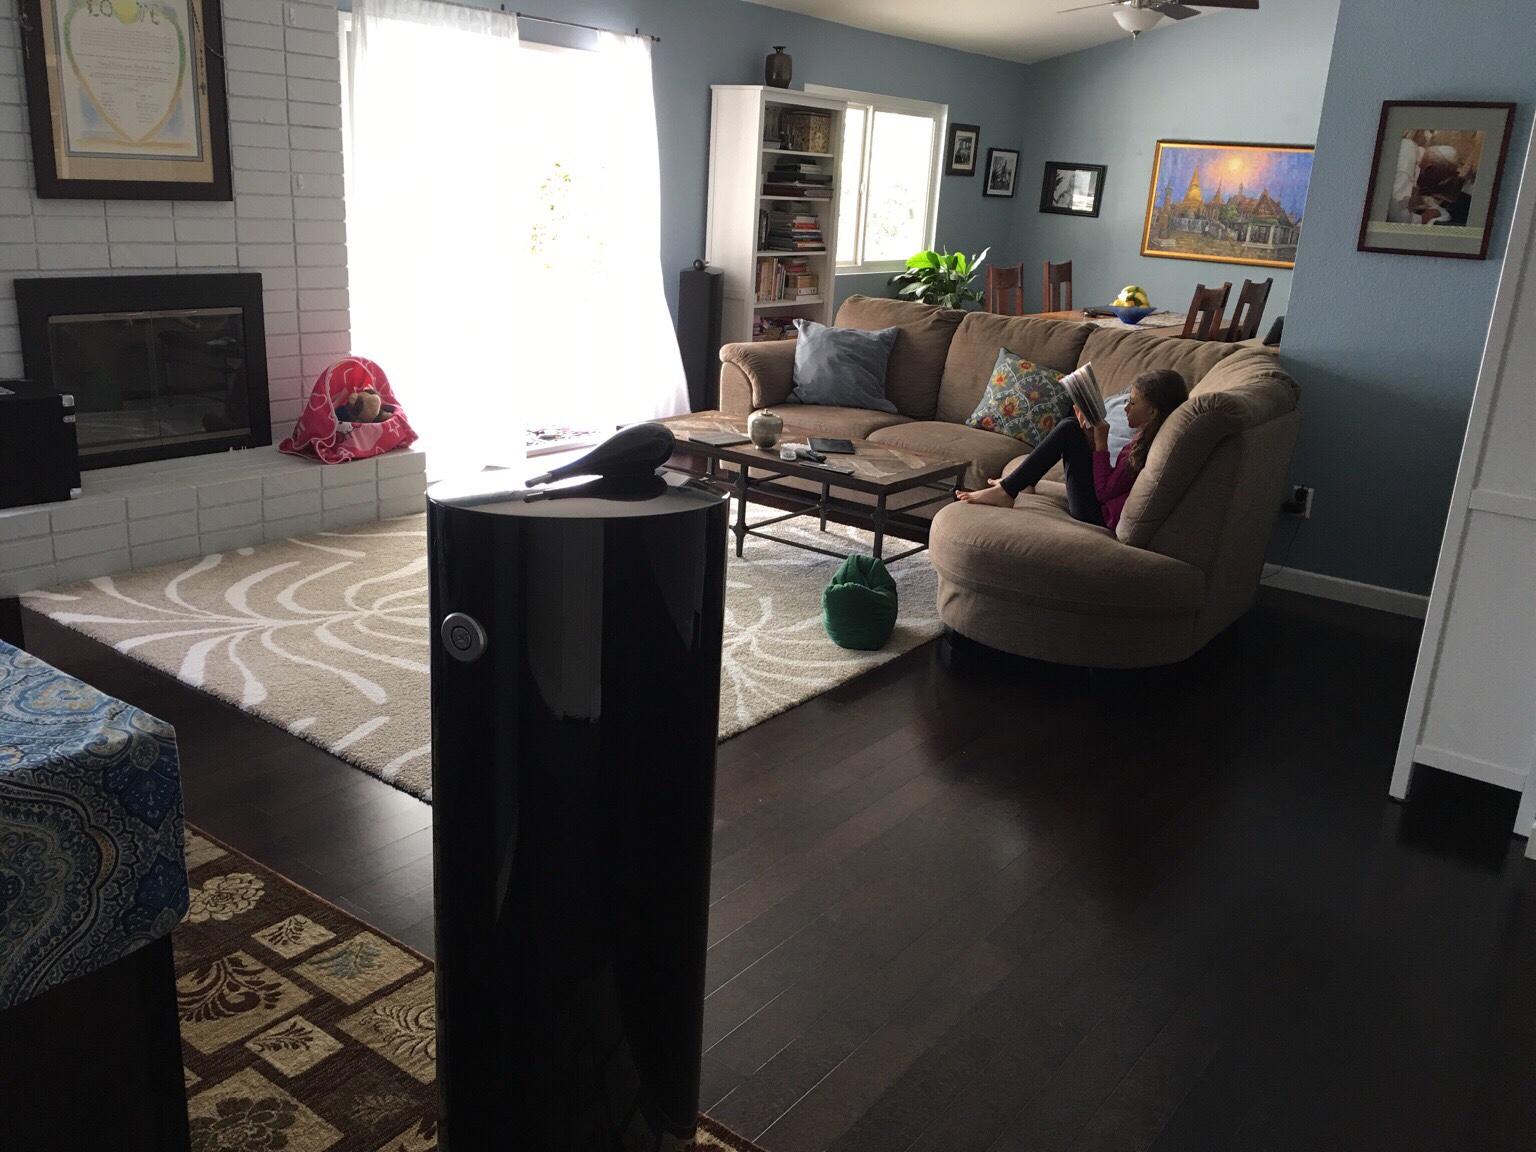 Magico s3 vs b w 802d3 avs forum home theater for Advanced interior designs reviews